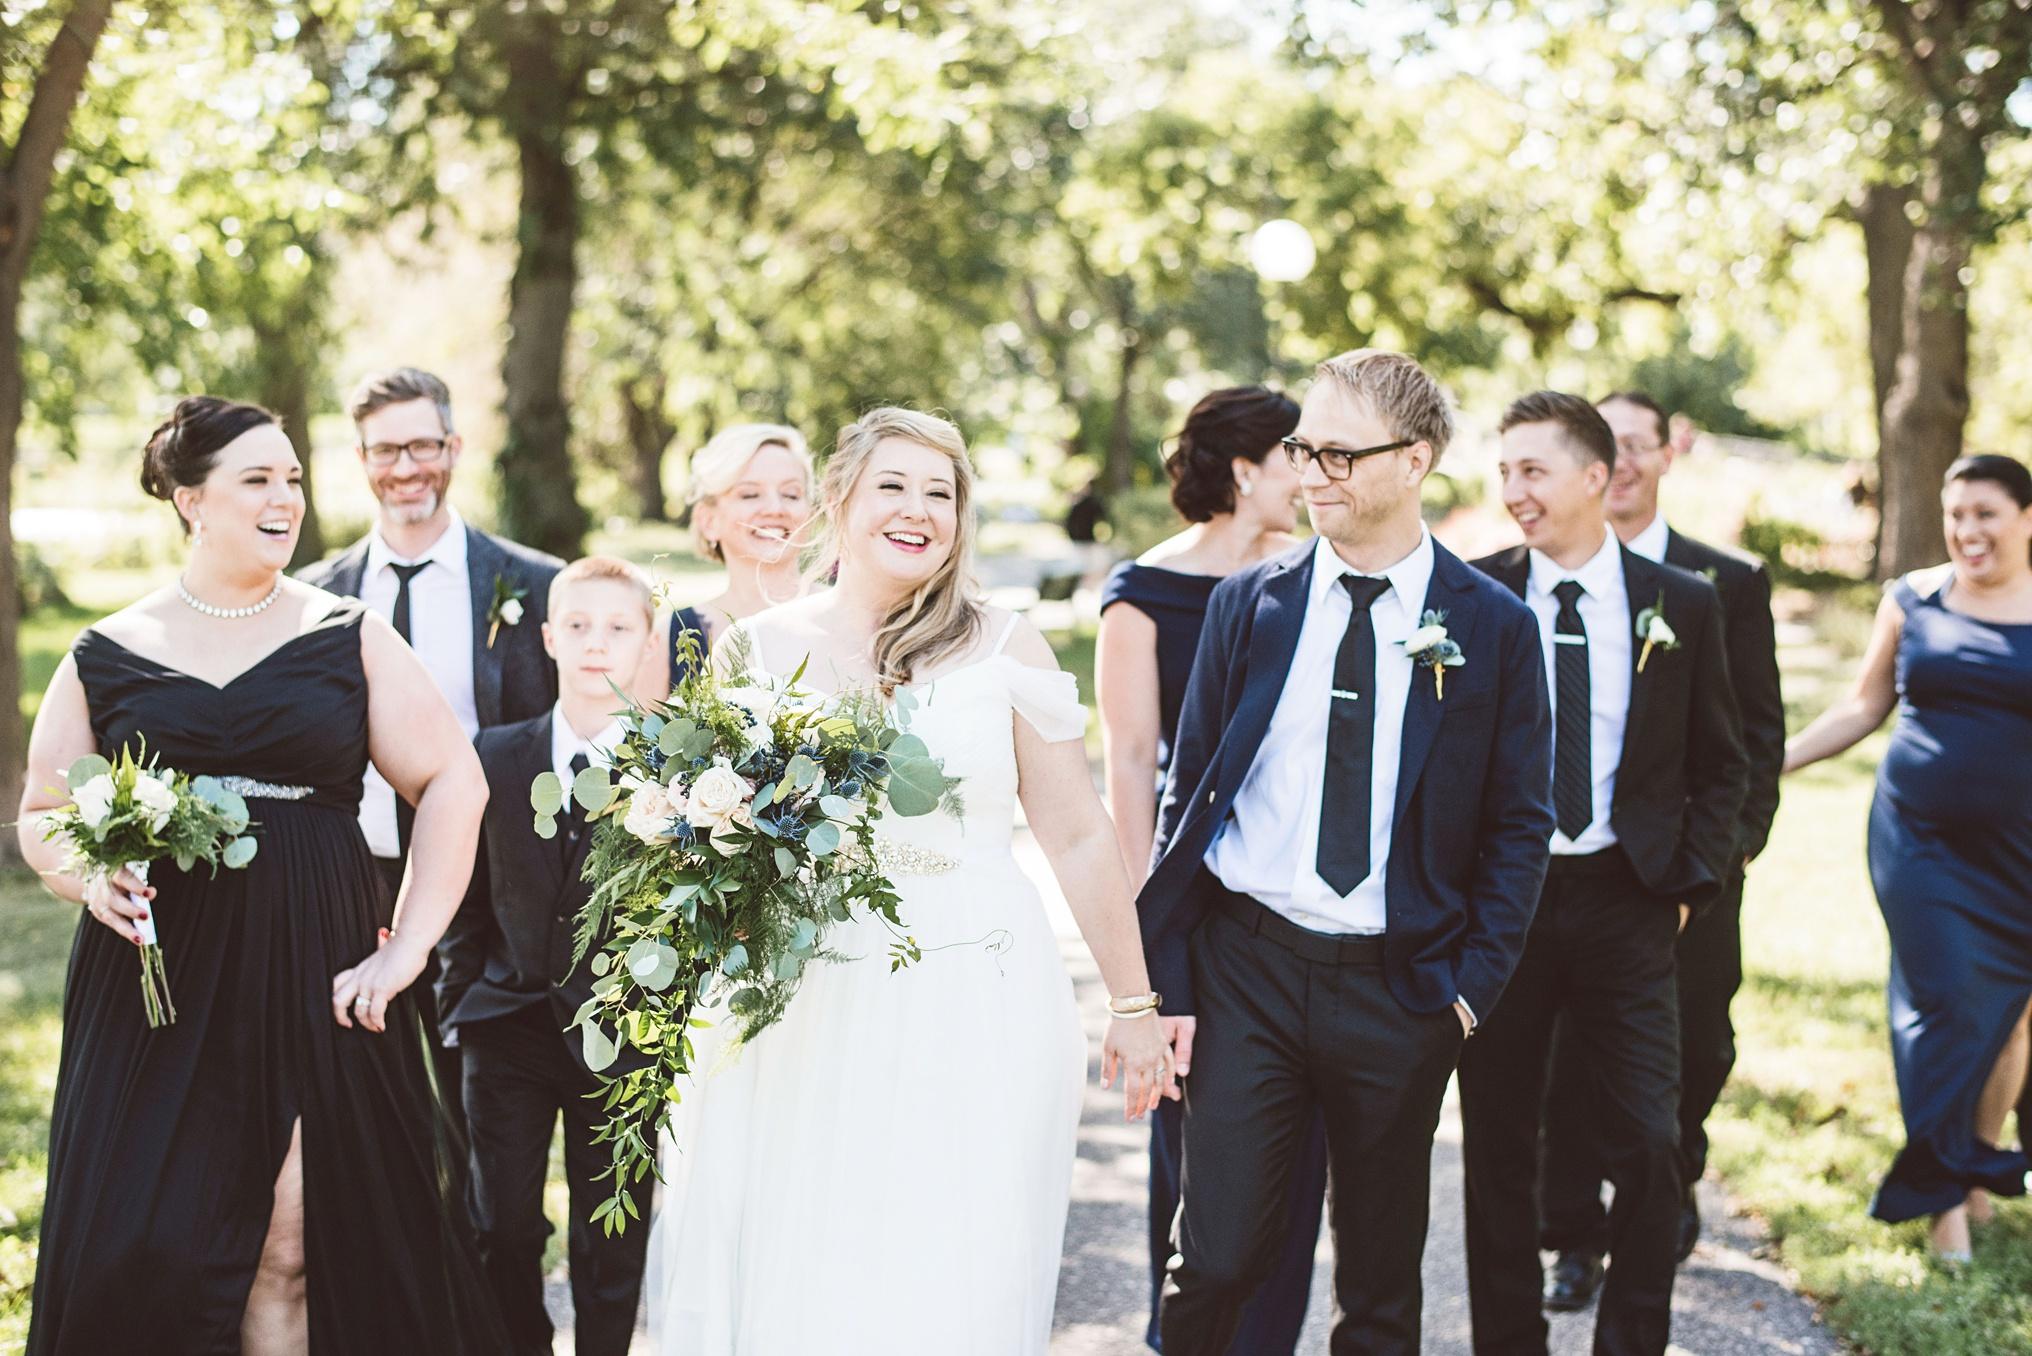 best_wedding_photography_2017_by_lucas_botz_photography_169.jpg